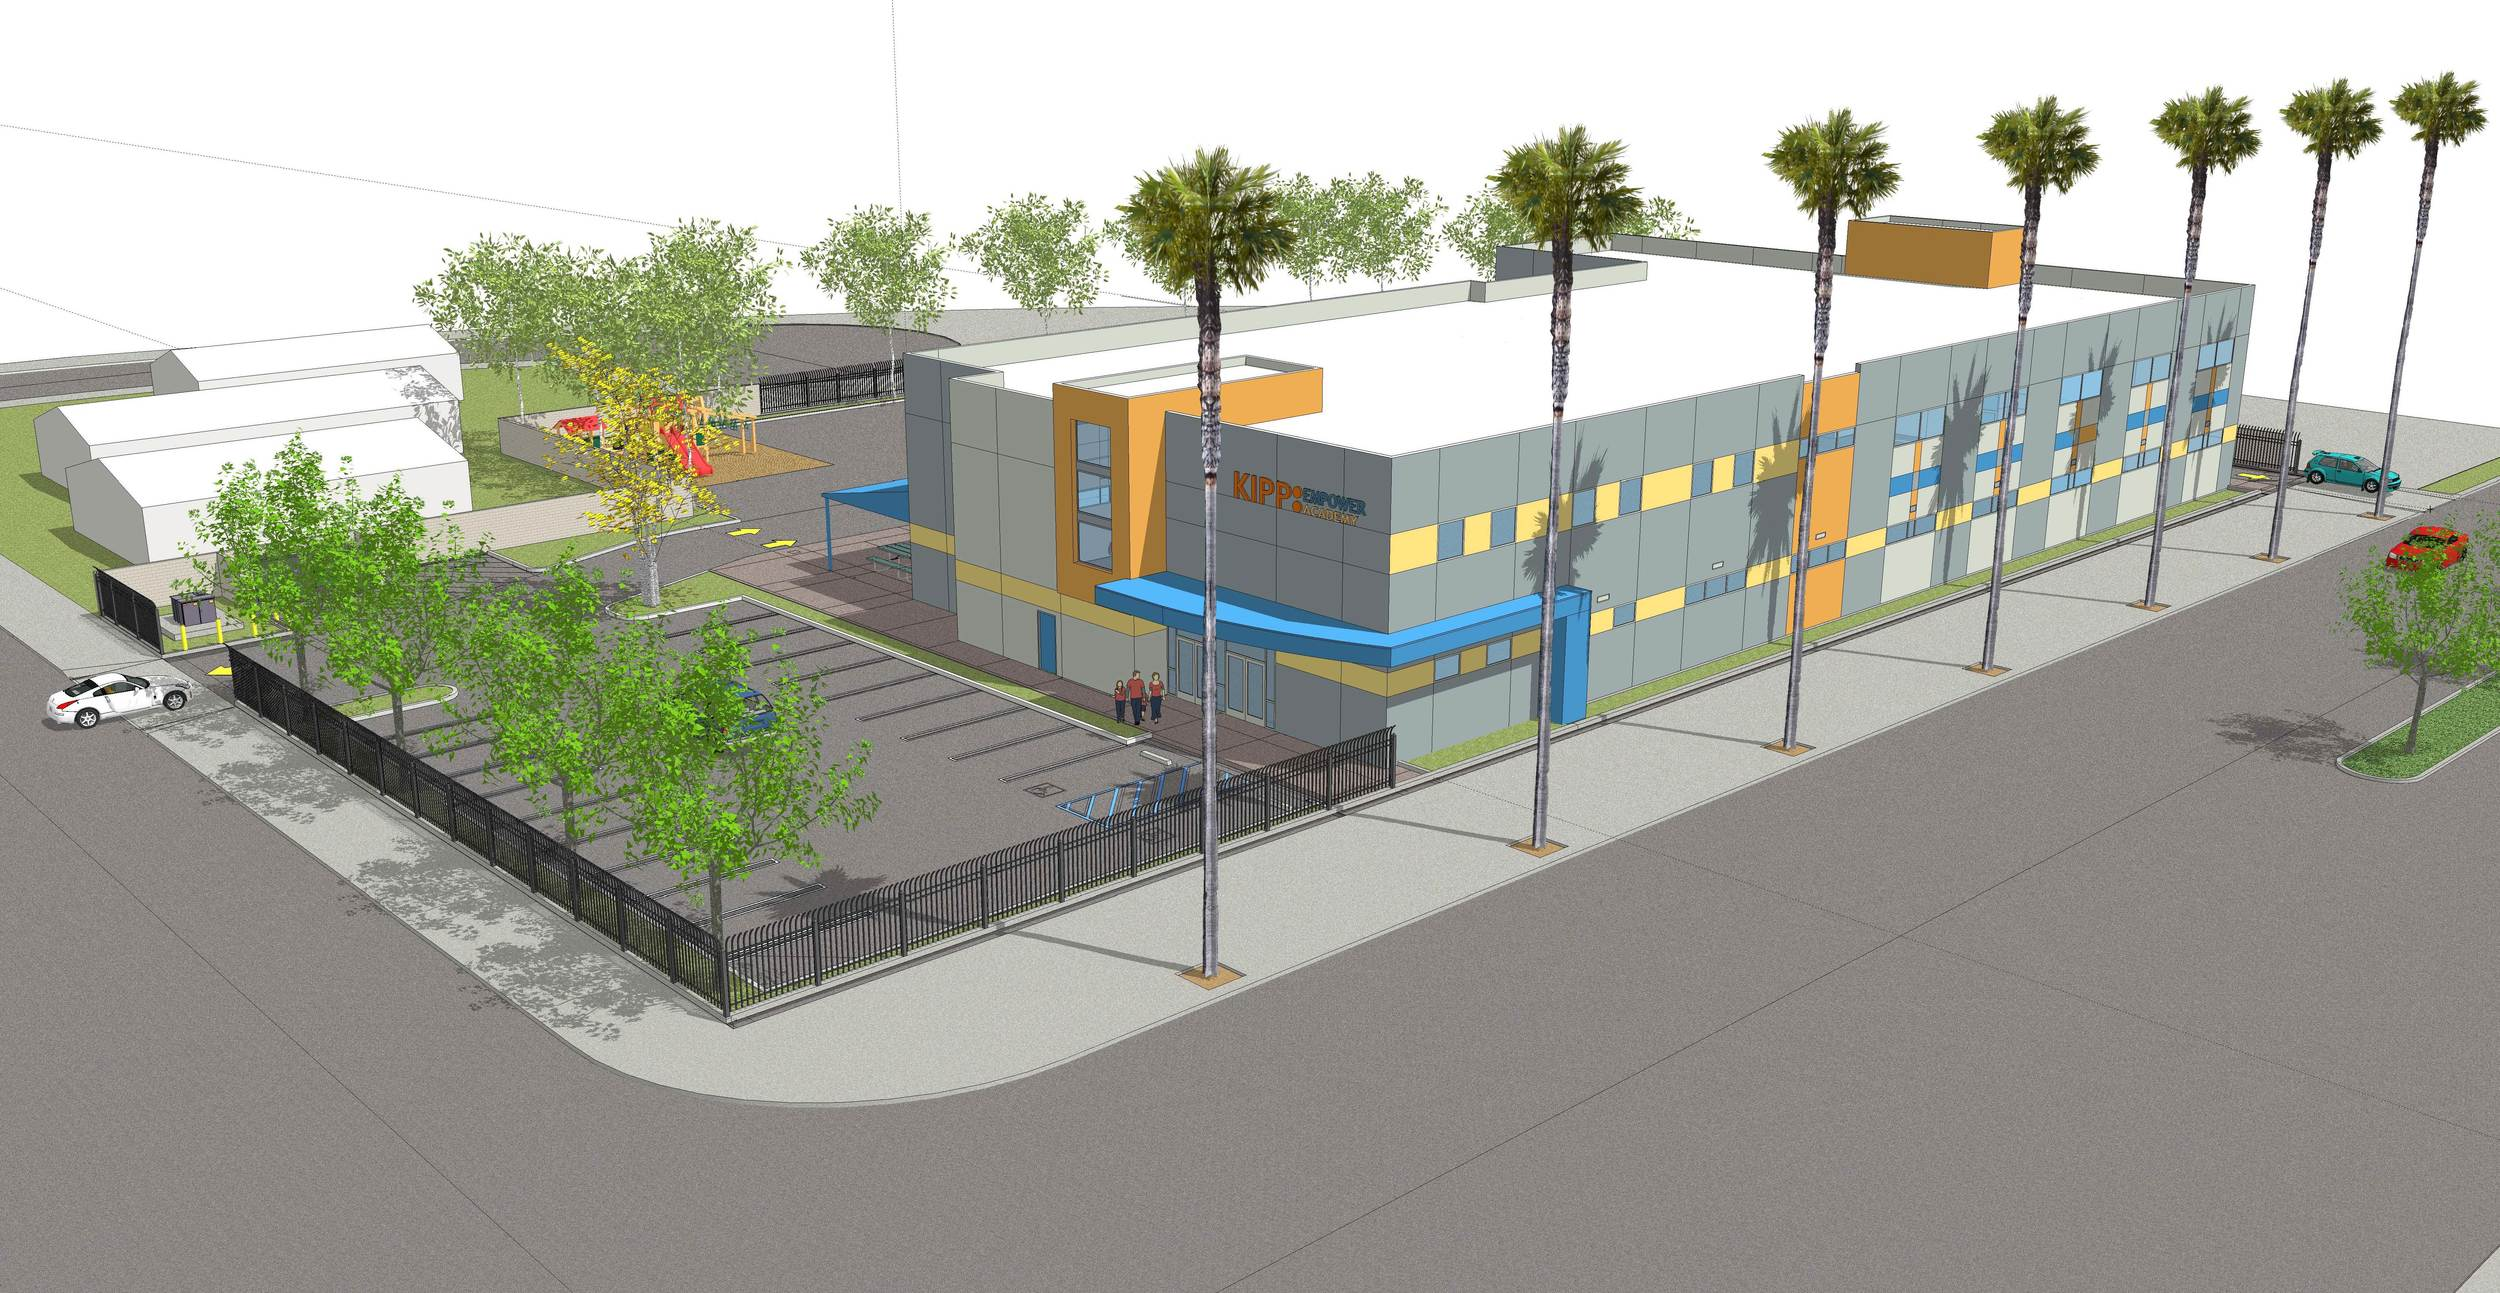 KIPP Empower Academy